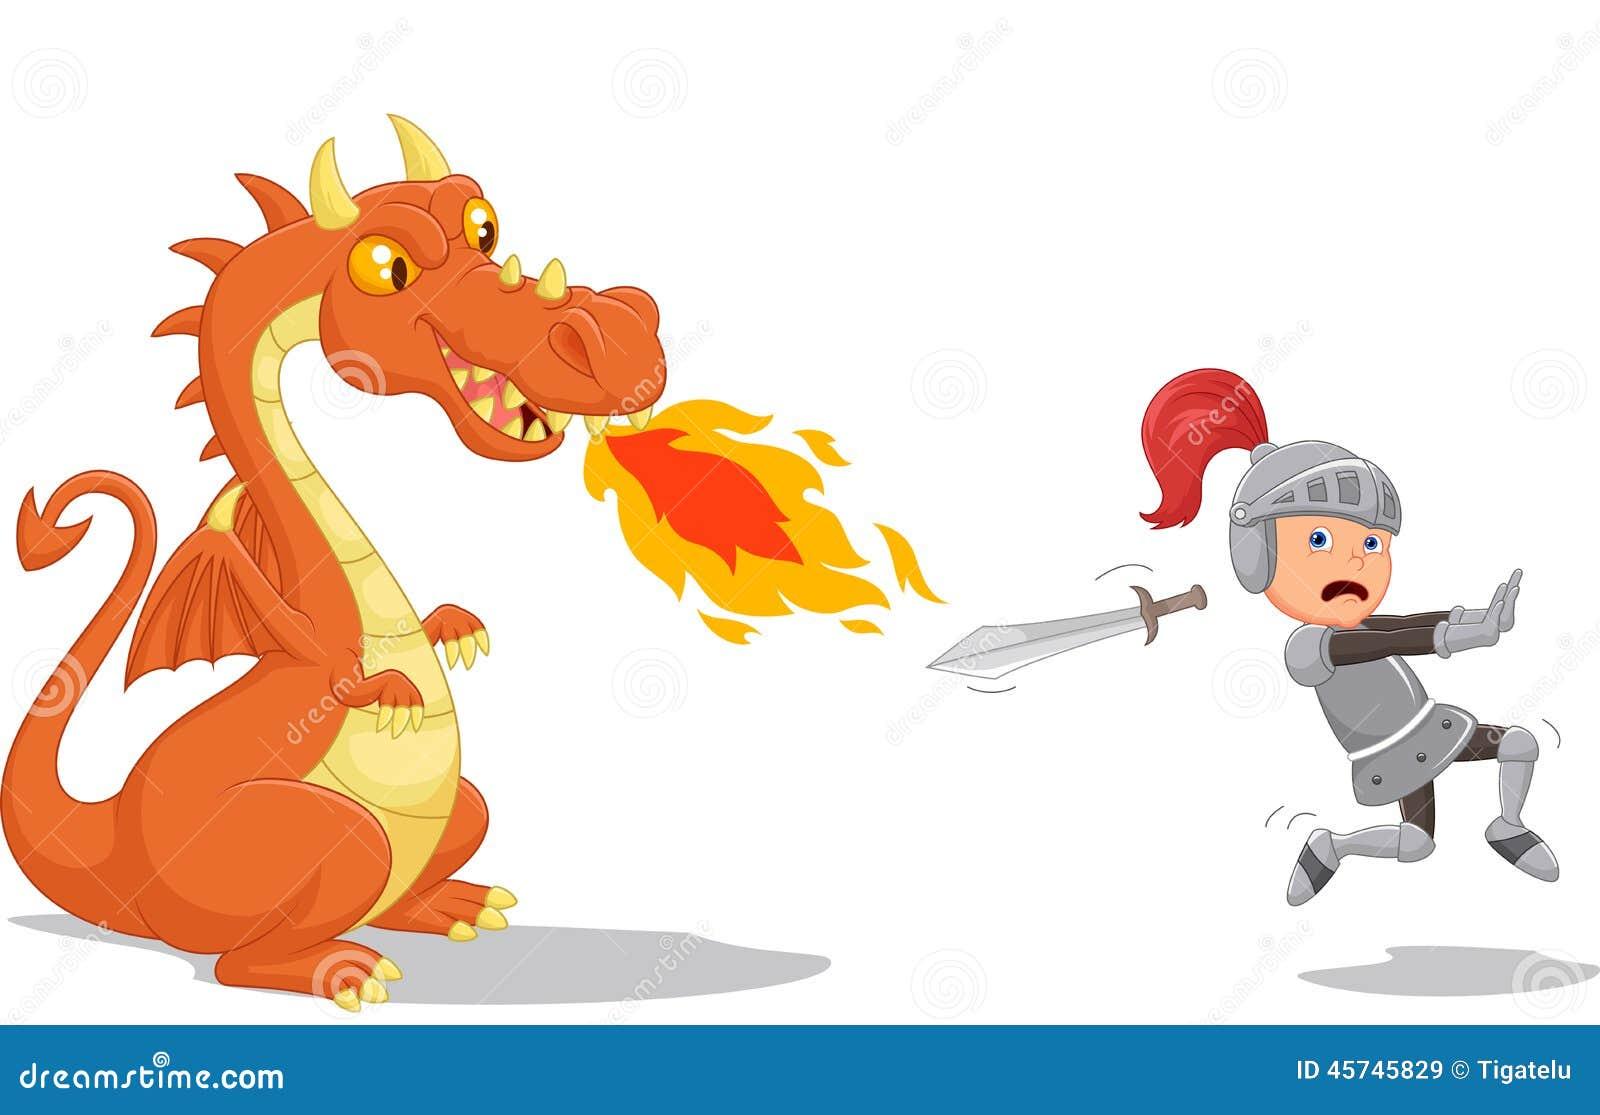 Dessin anim d 39 un chevalier ex cutant d 39 un dragon f roce - Dessin d un dragon ...